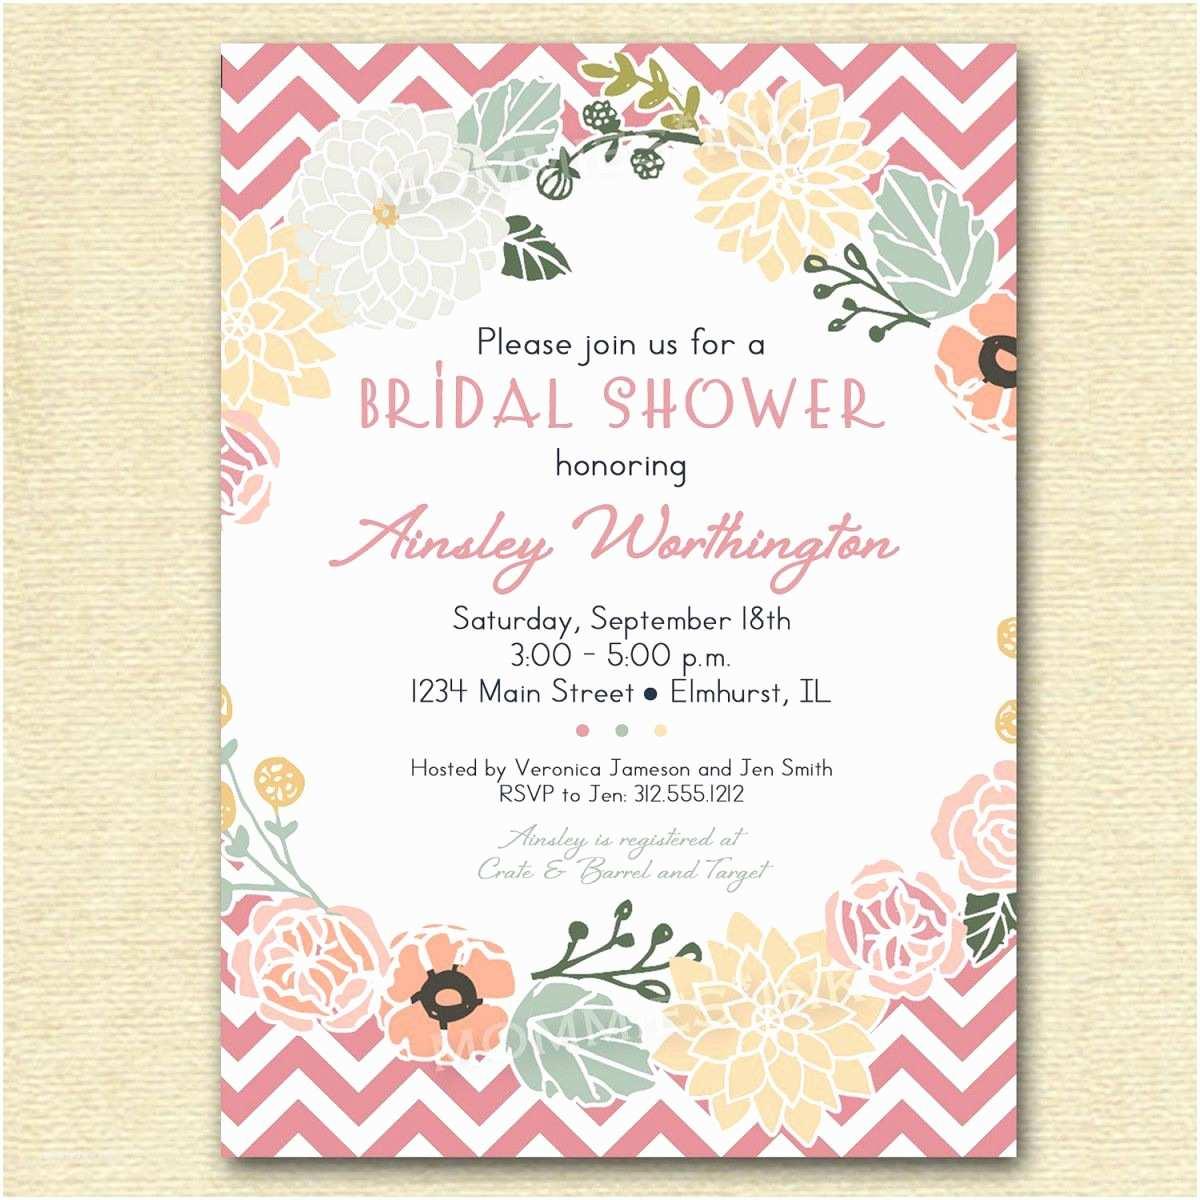 Cheap Bridal Shower Invitations Cheap Wedding Shower Invitations Cheap Bridal Shower